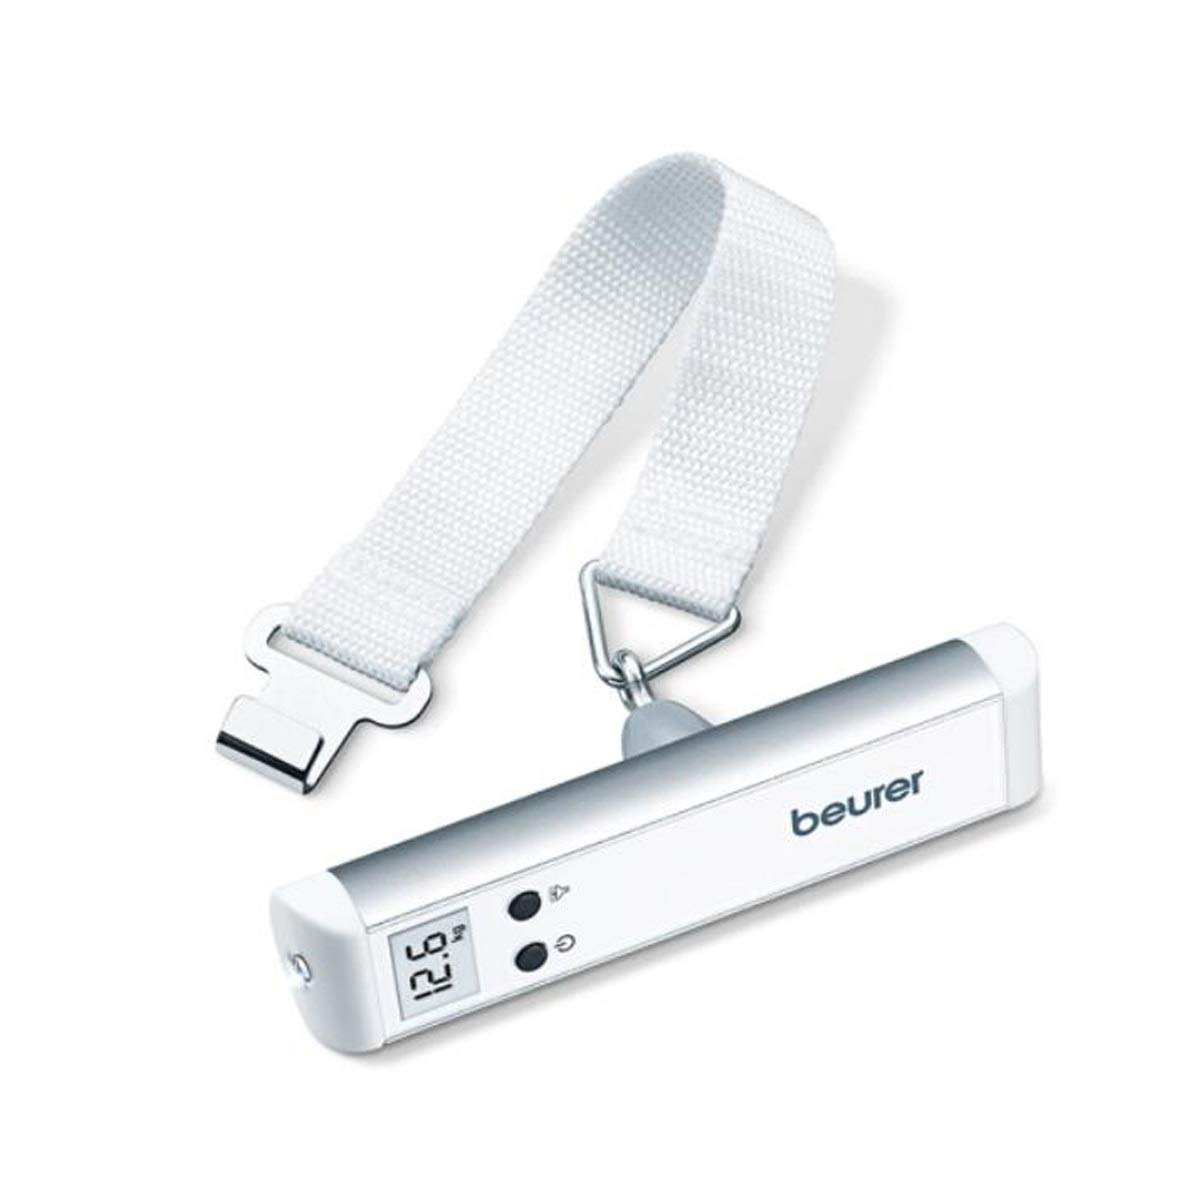 Kaiyitong Electronic Scale, Portable Portable Scale, High Precision Electronic Scale Mini Scale, 50kg (Color : White)